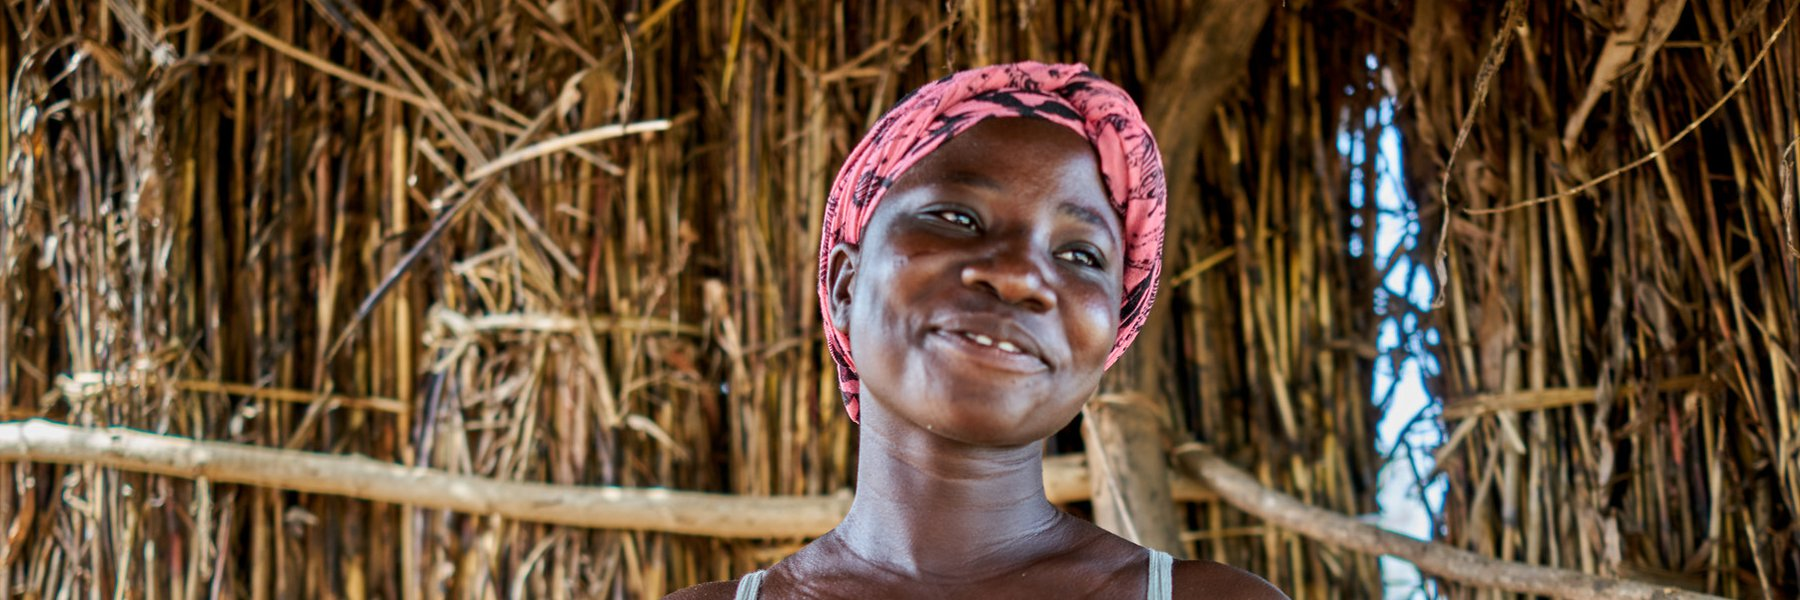 Lucy holding phone, Ghana